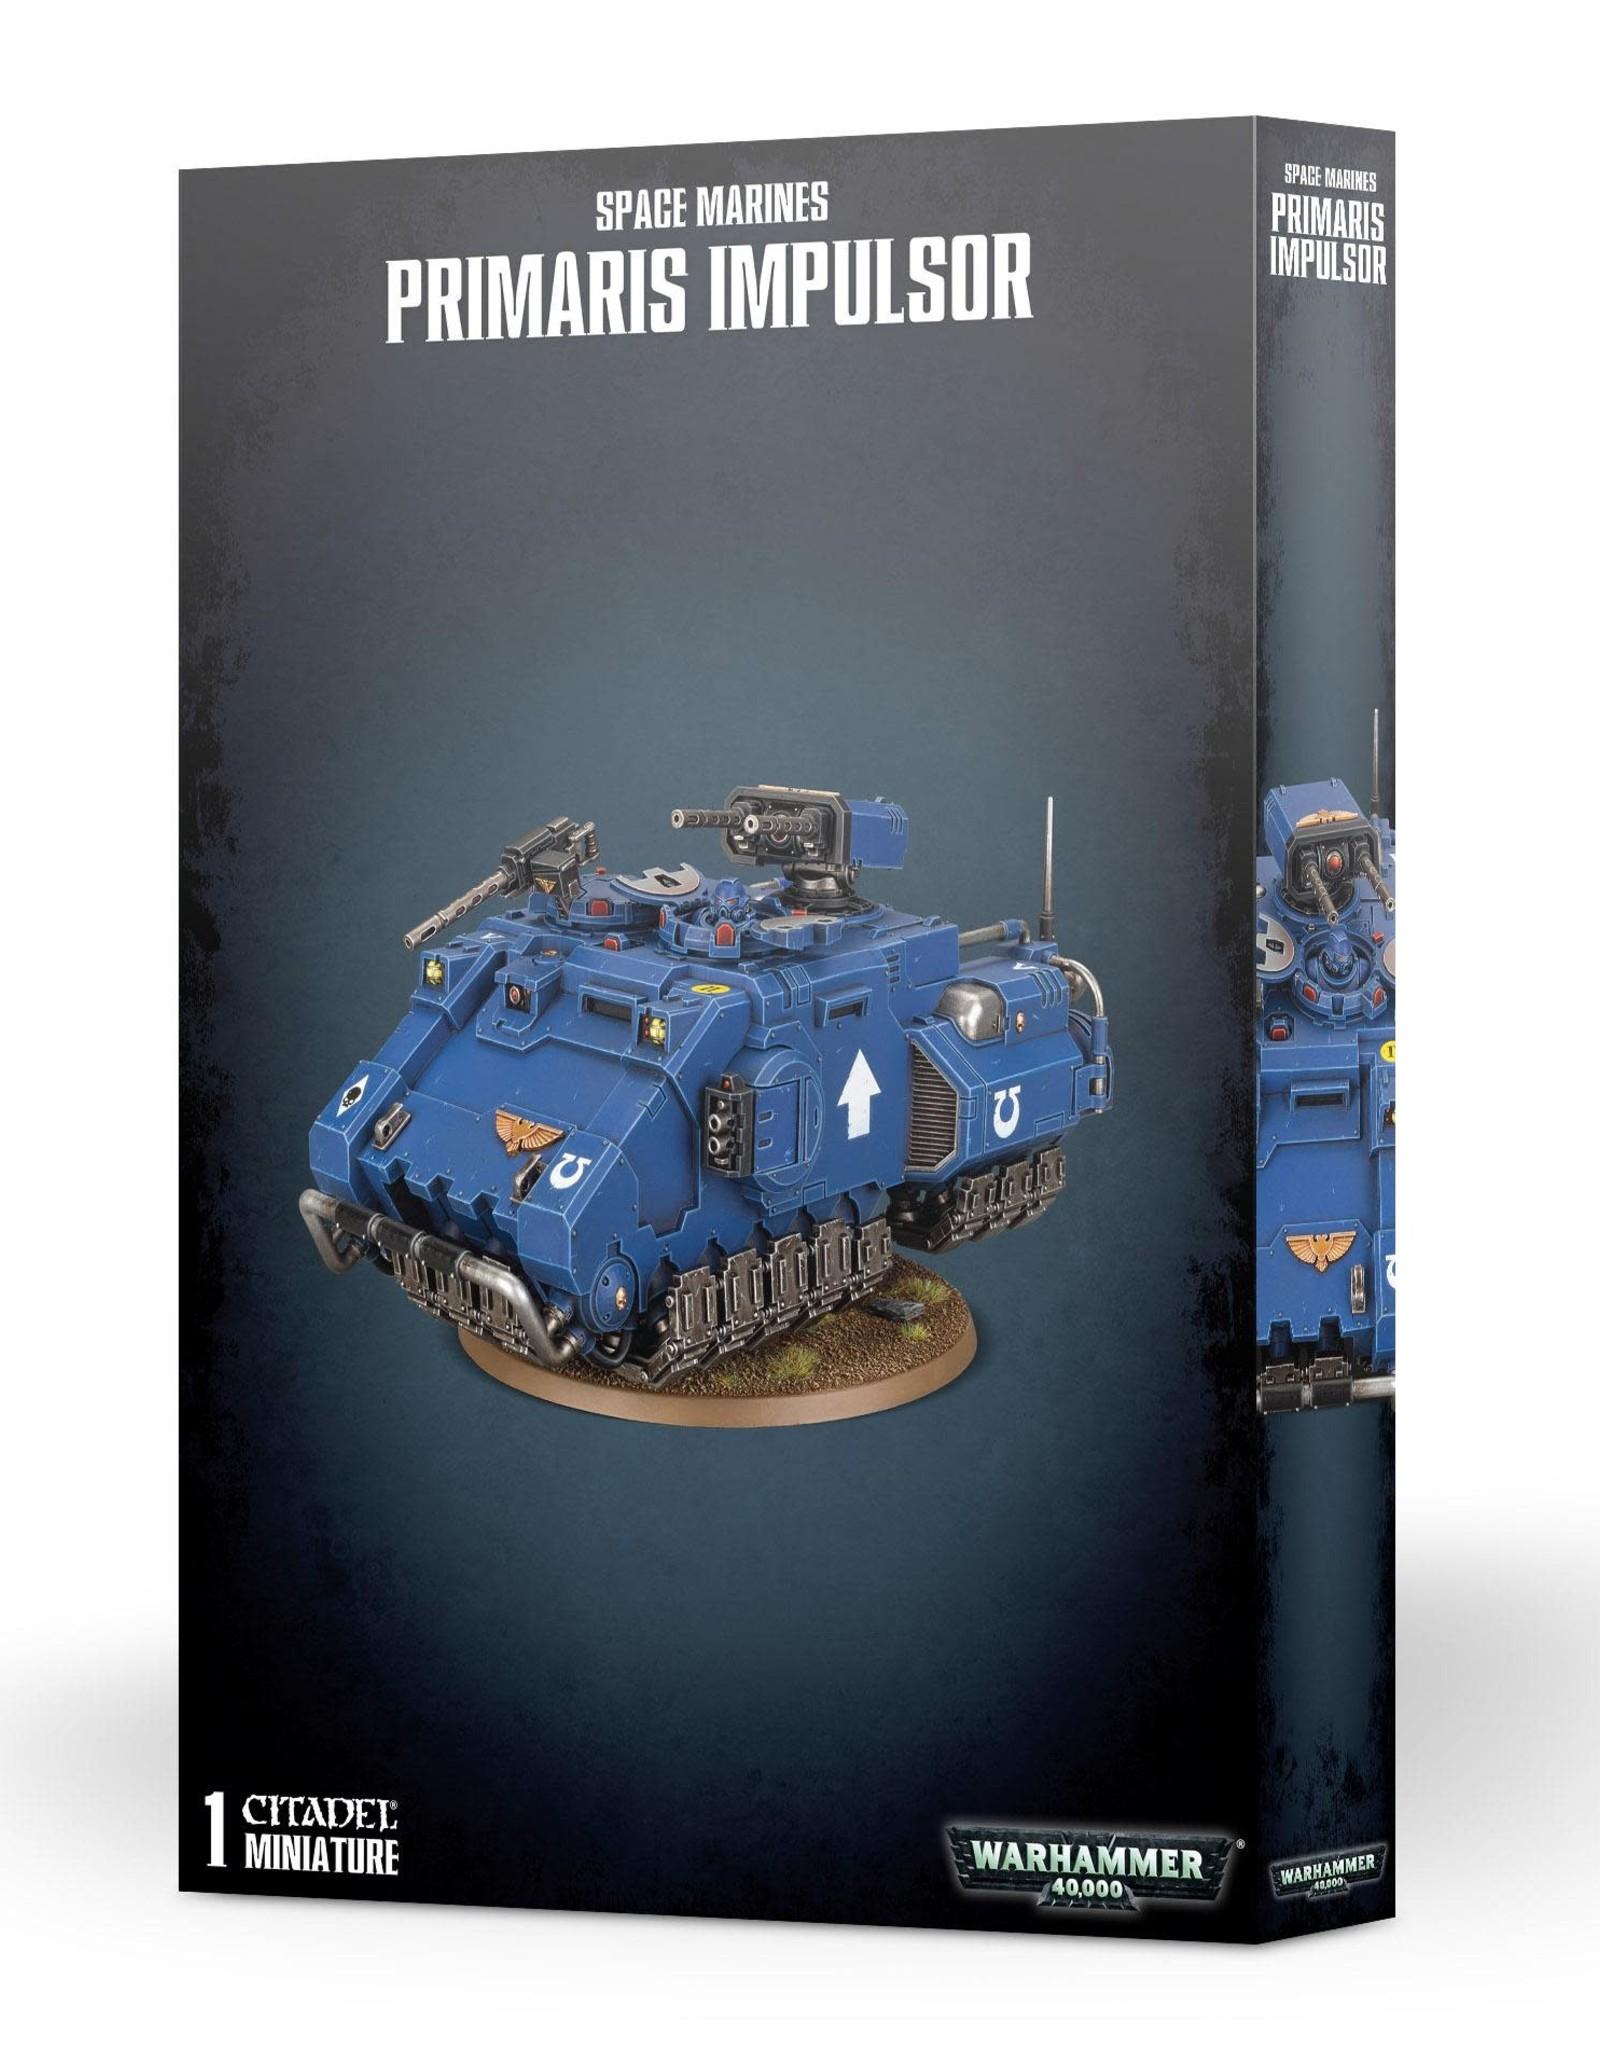 Warhammer 40K Space Marines Primaris Impulsor